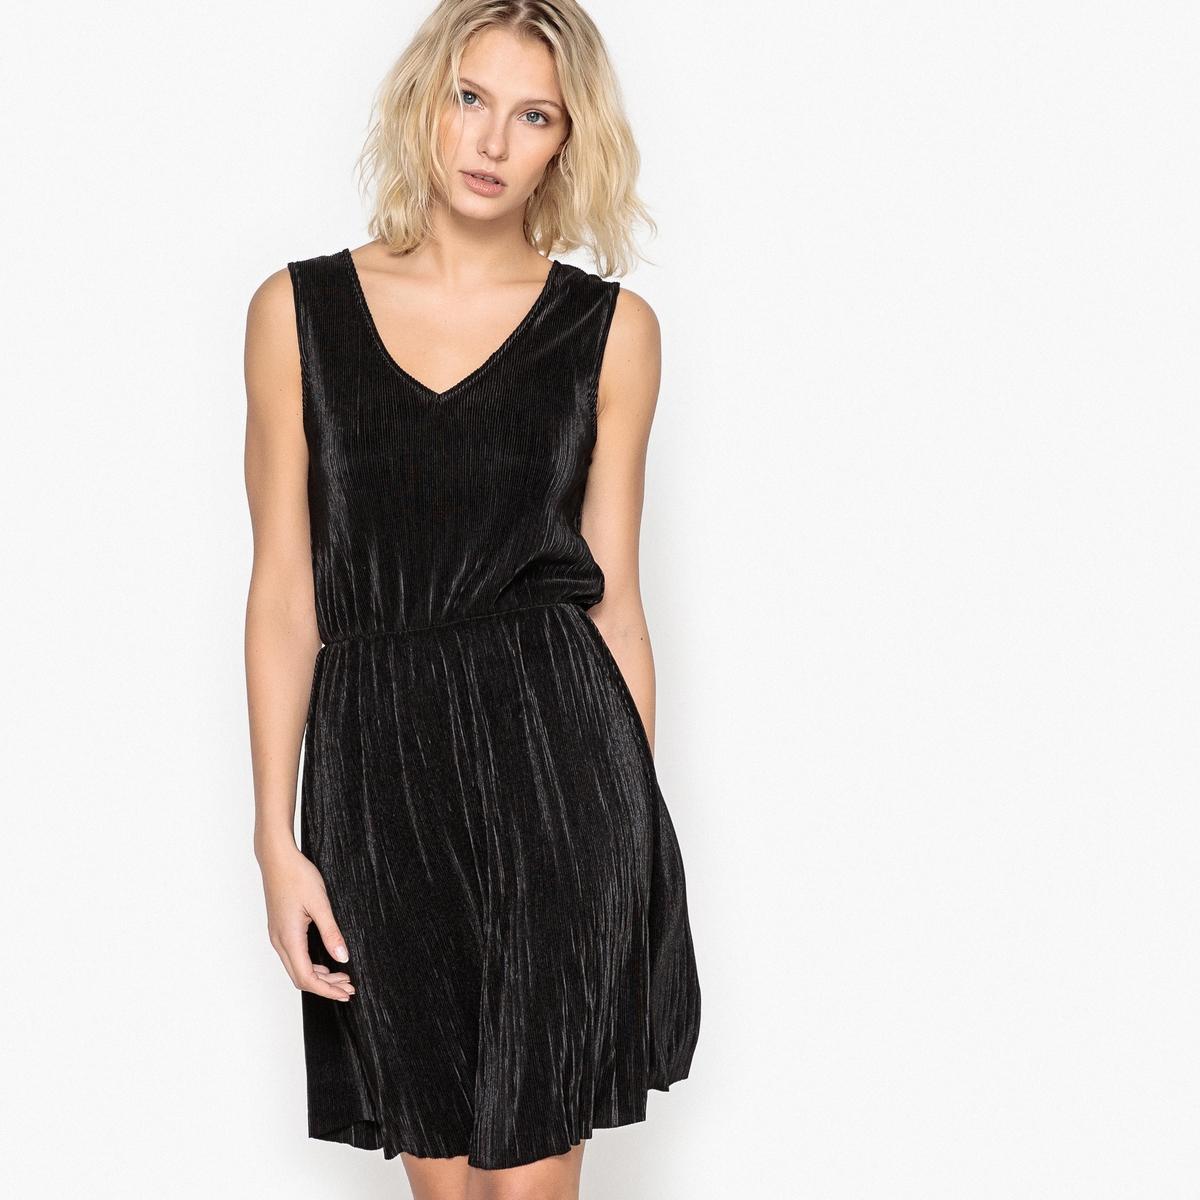 Plisowana sukienka, dekolt w serek, bez rękawów